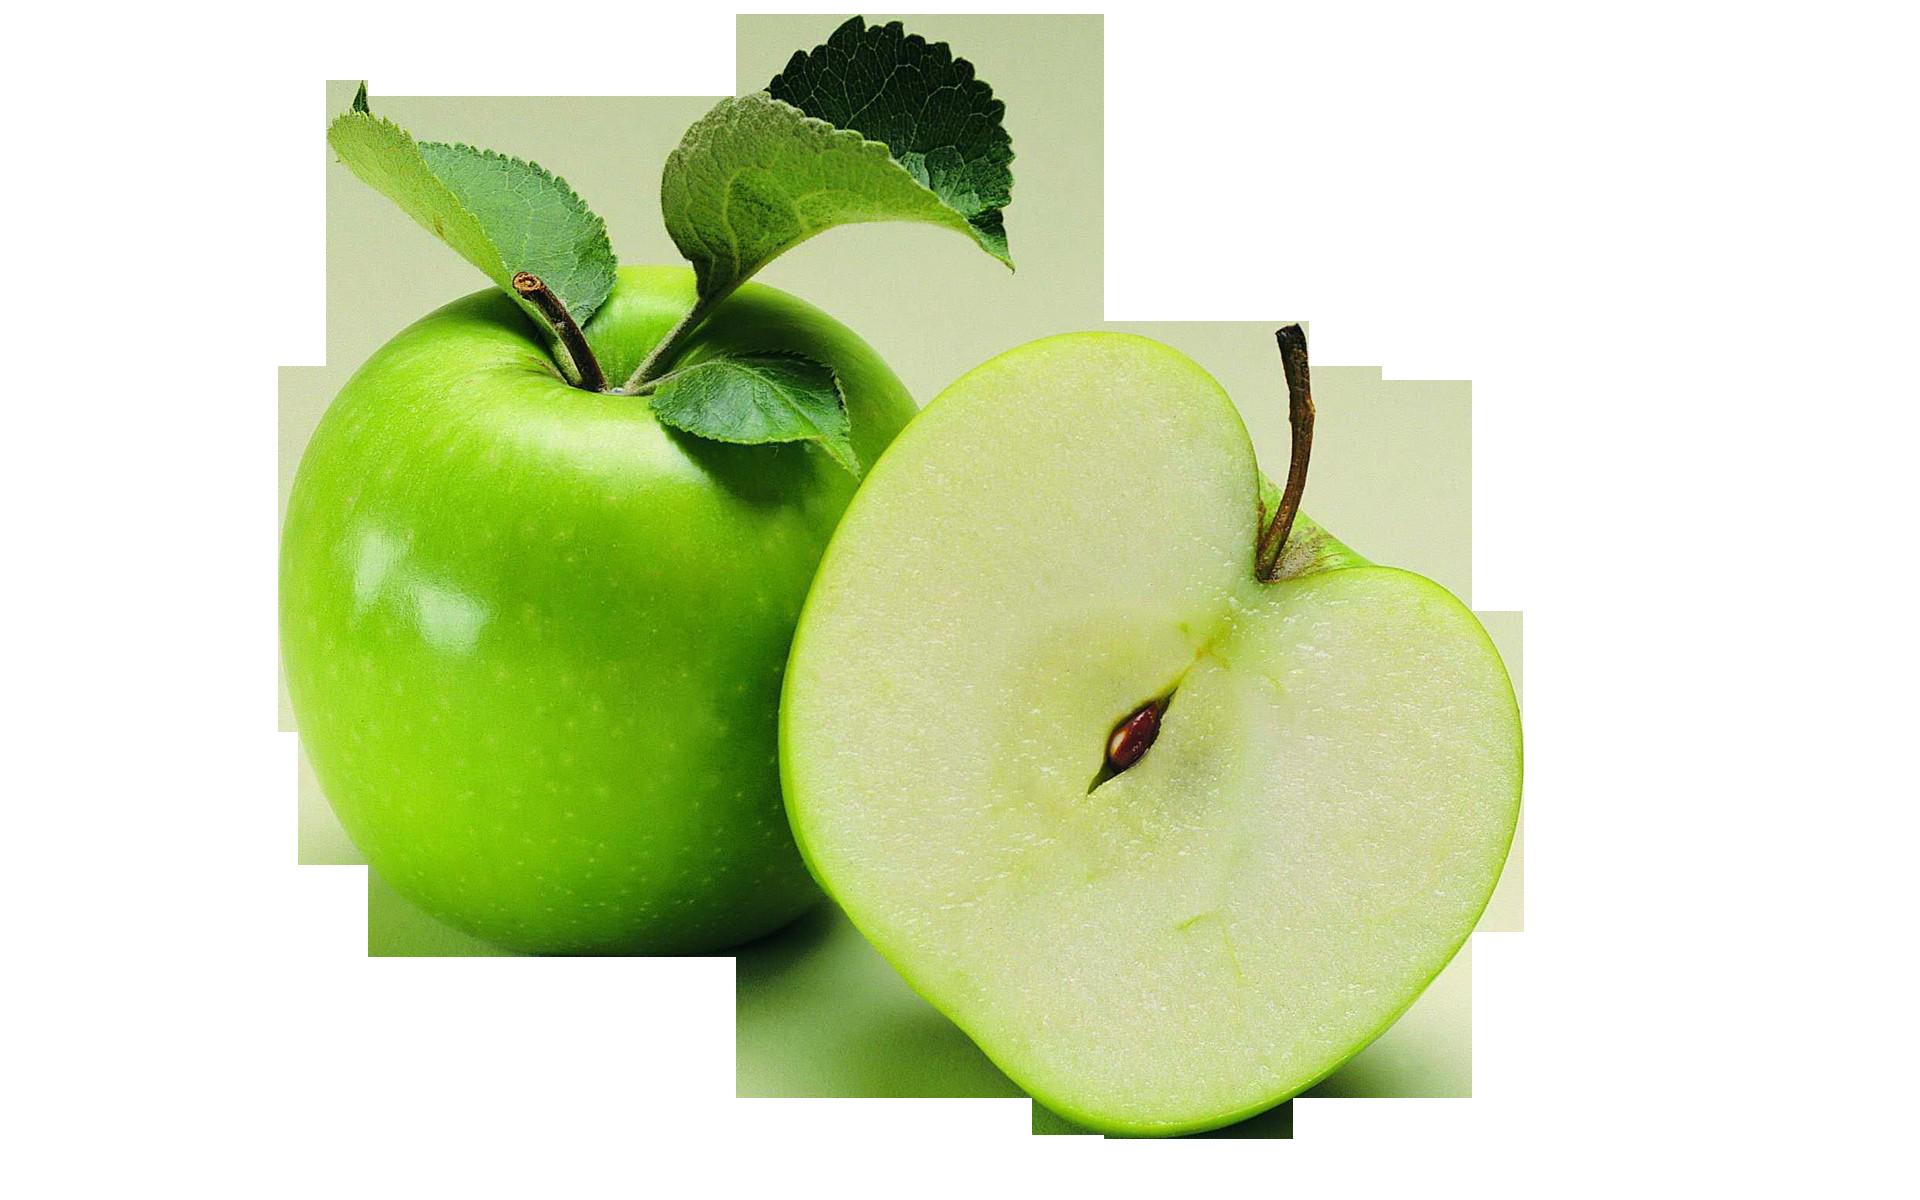 Green Apple PNG Image - PurePNG   Free transparent CC0 PNG ...